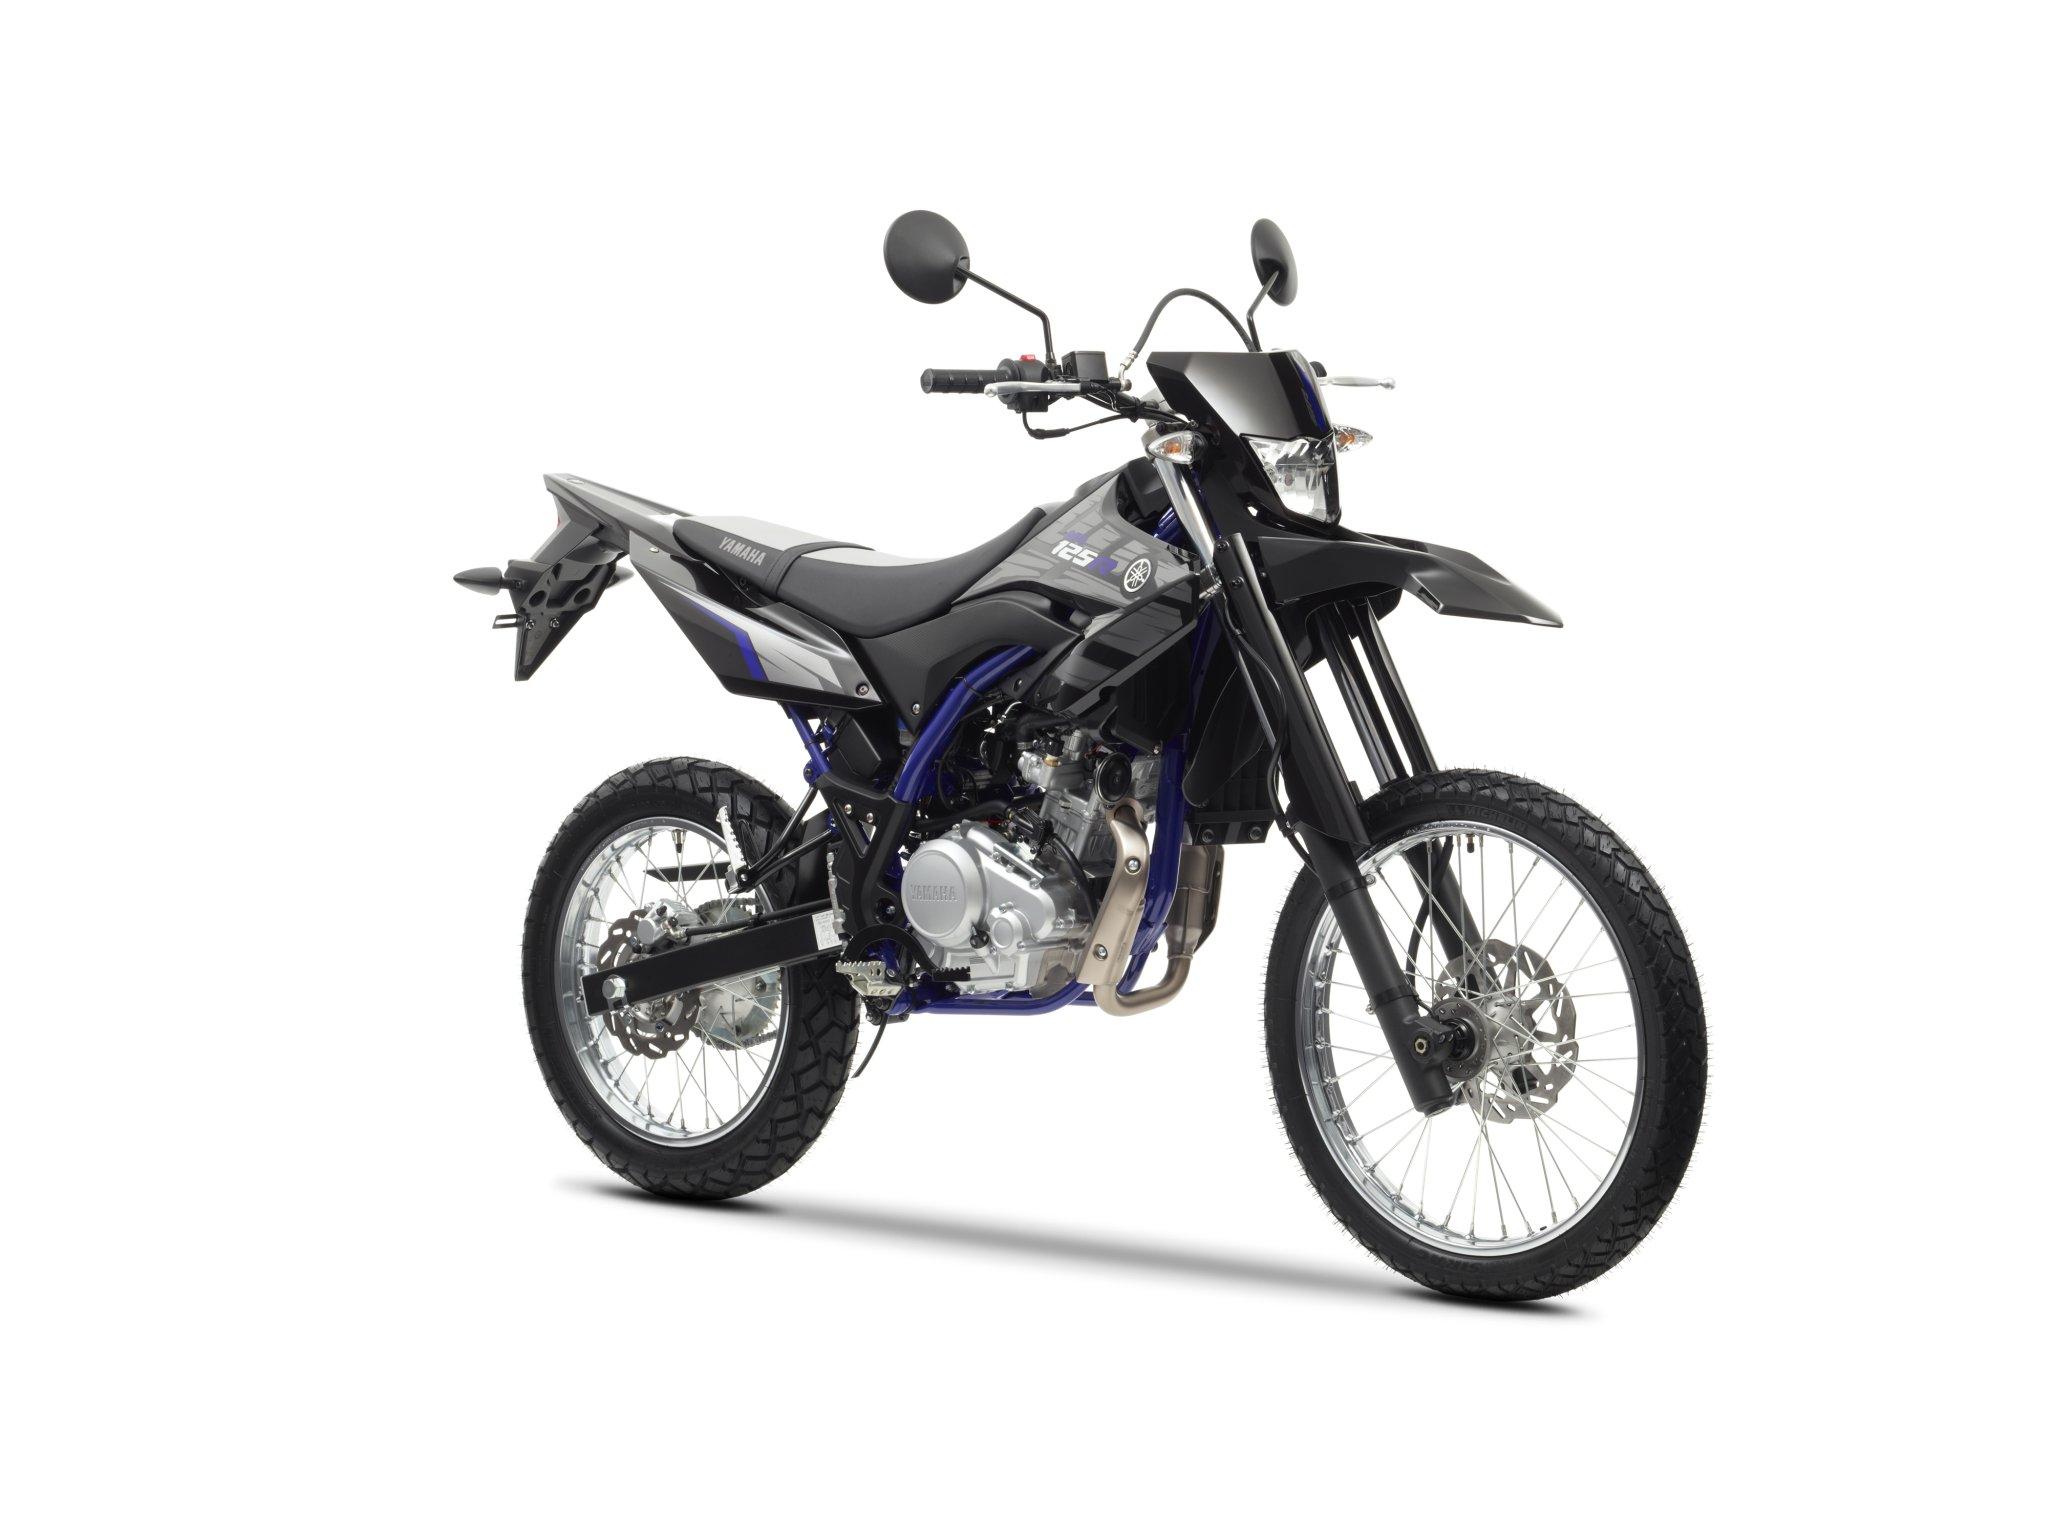 Yamaha WR125X / WR125R - Modellnews